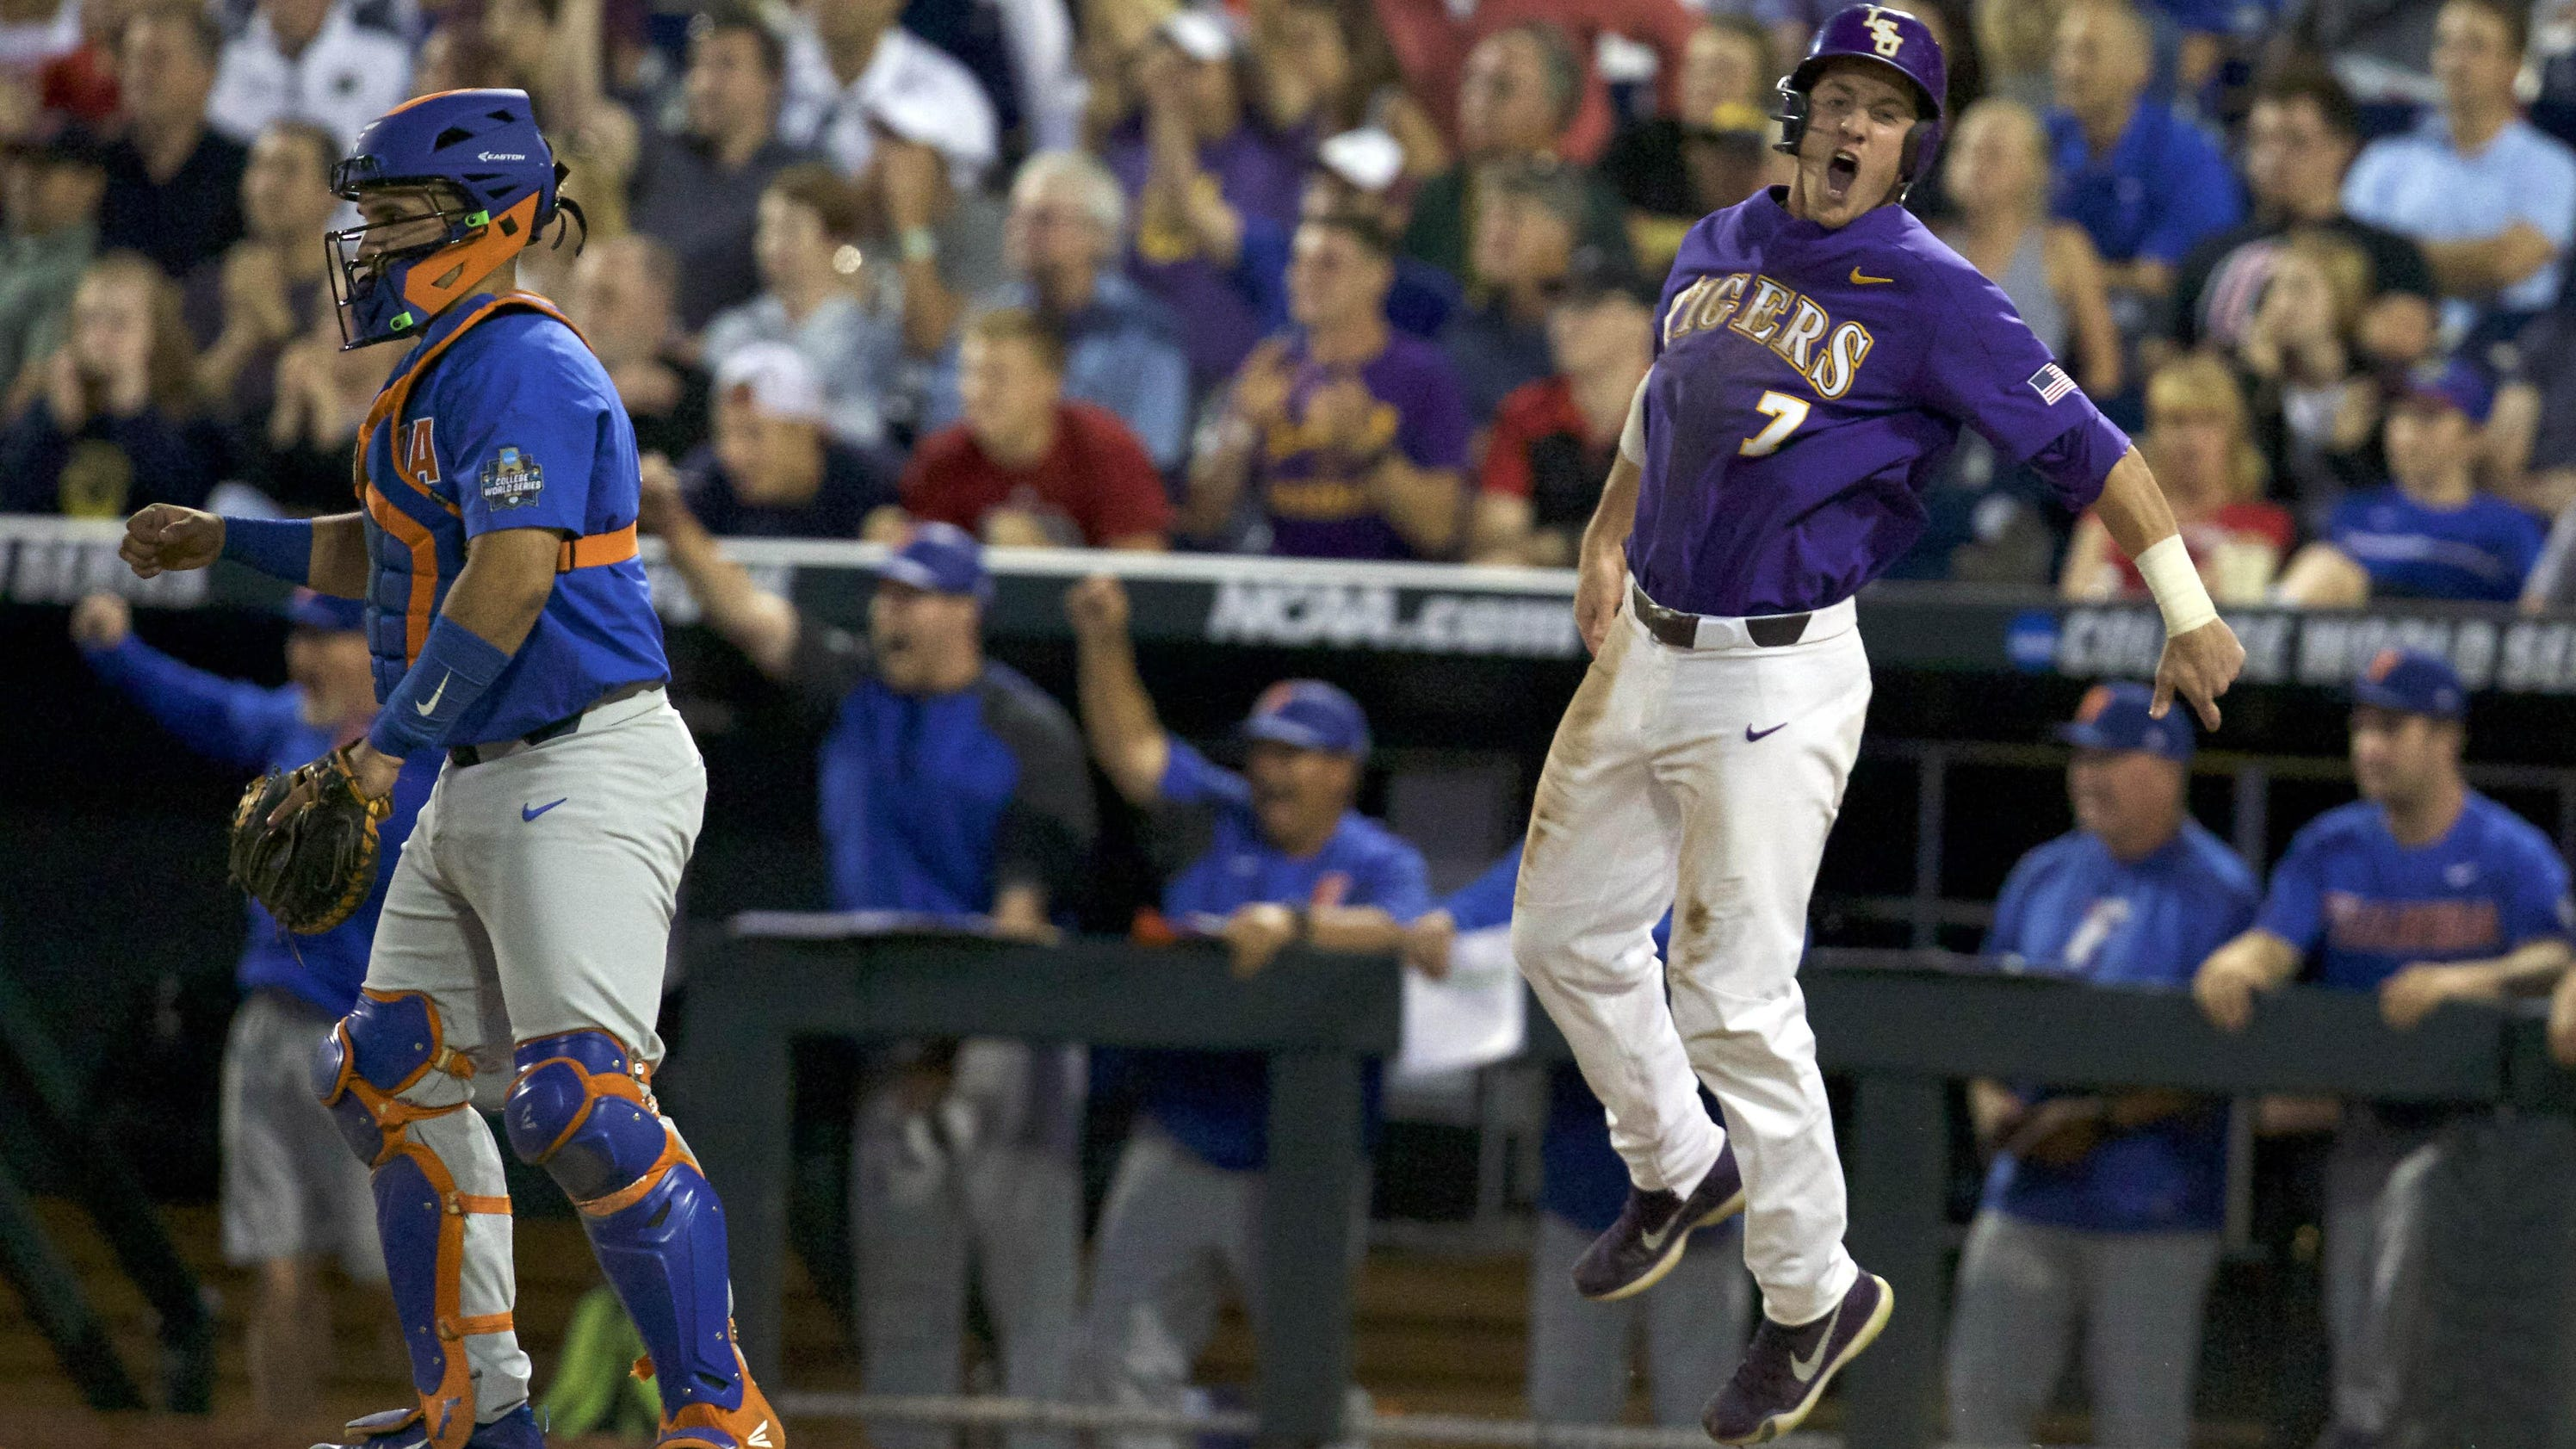 000 Lsu Baseball Dads Save Florida